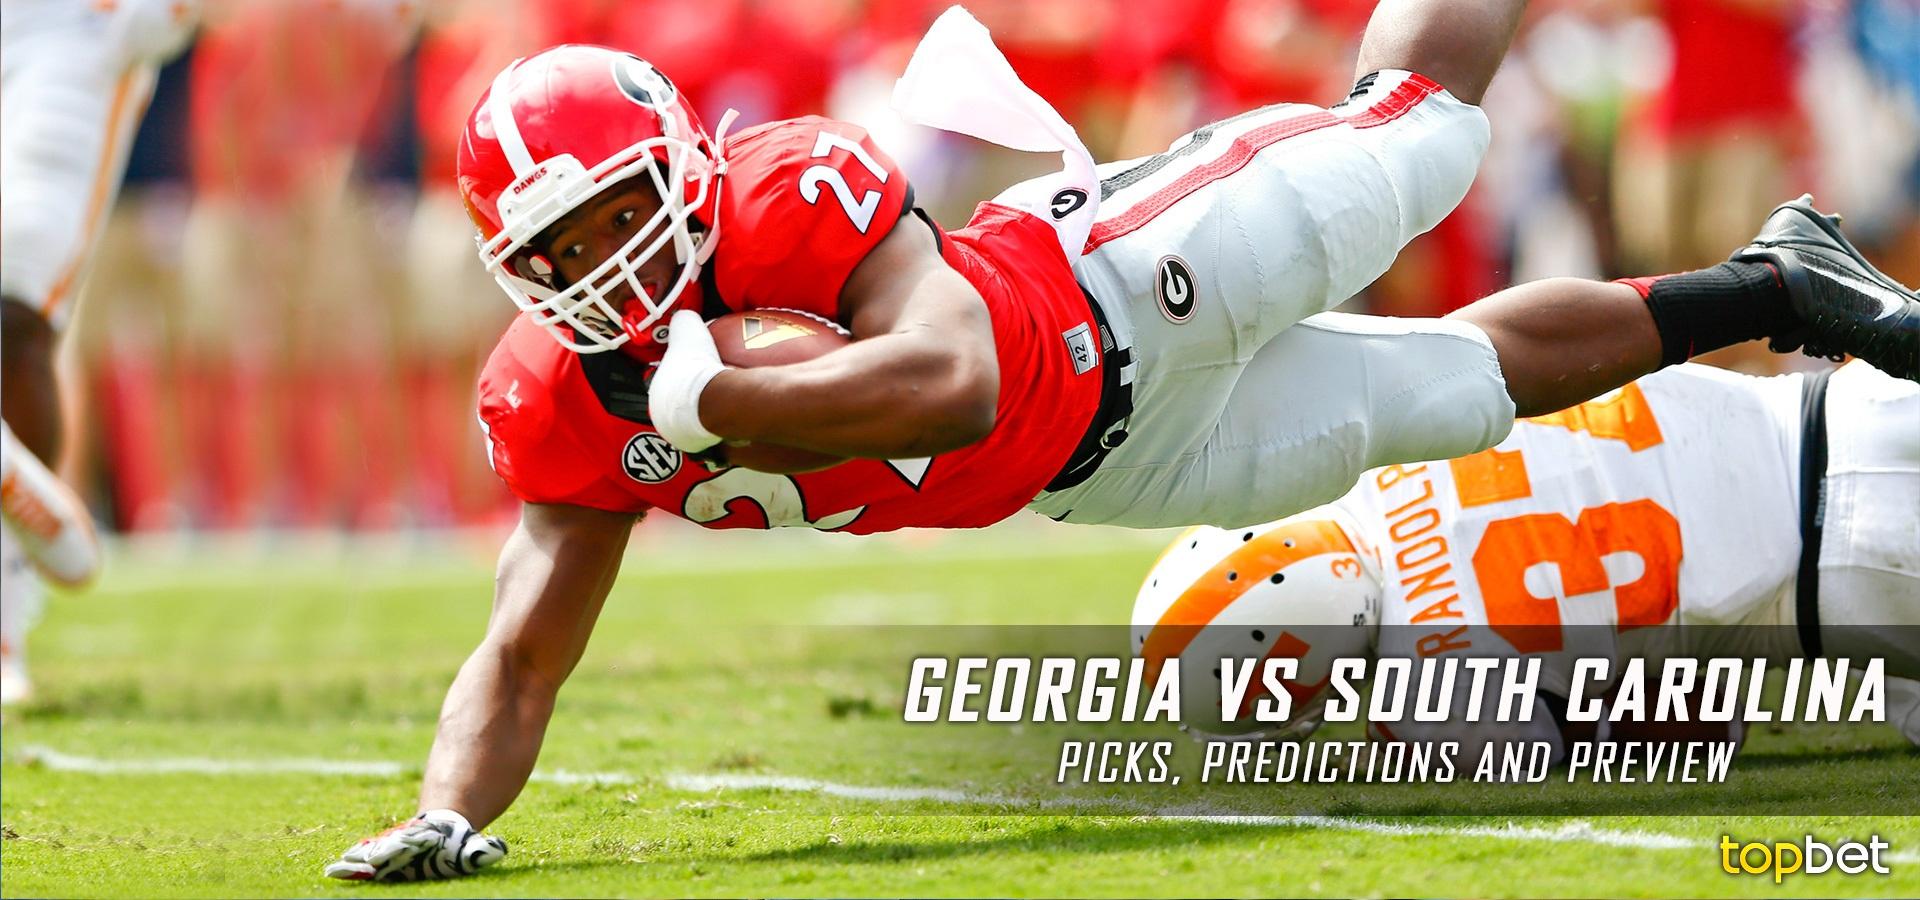 Georgia vs South Carolina Football Predictions, Picks and Odds